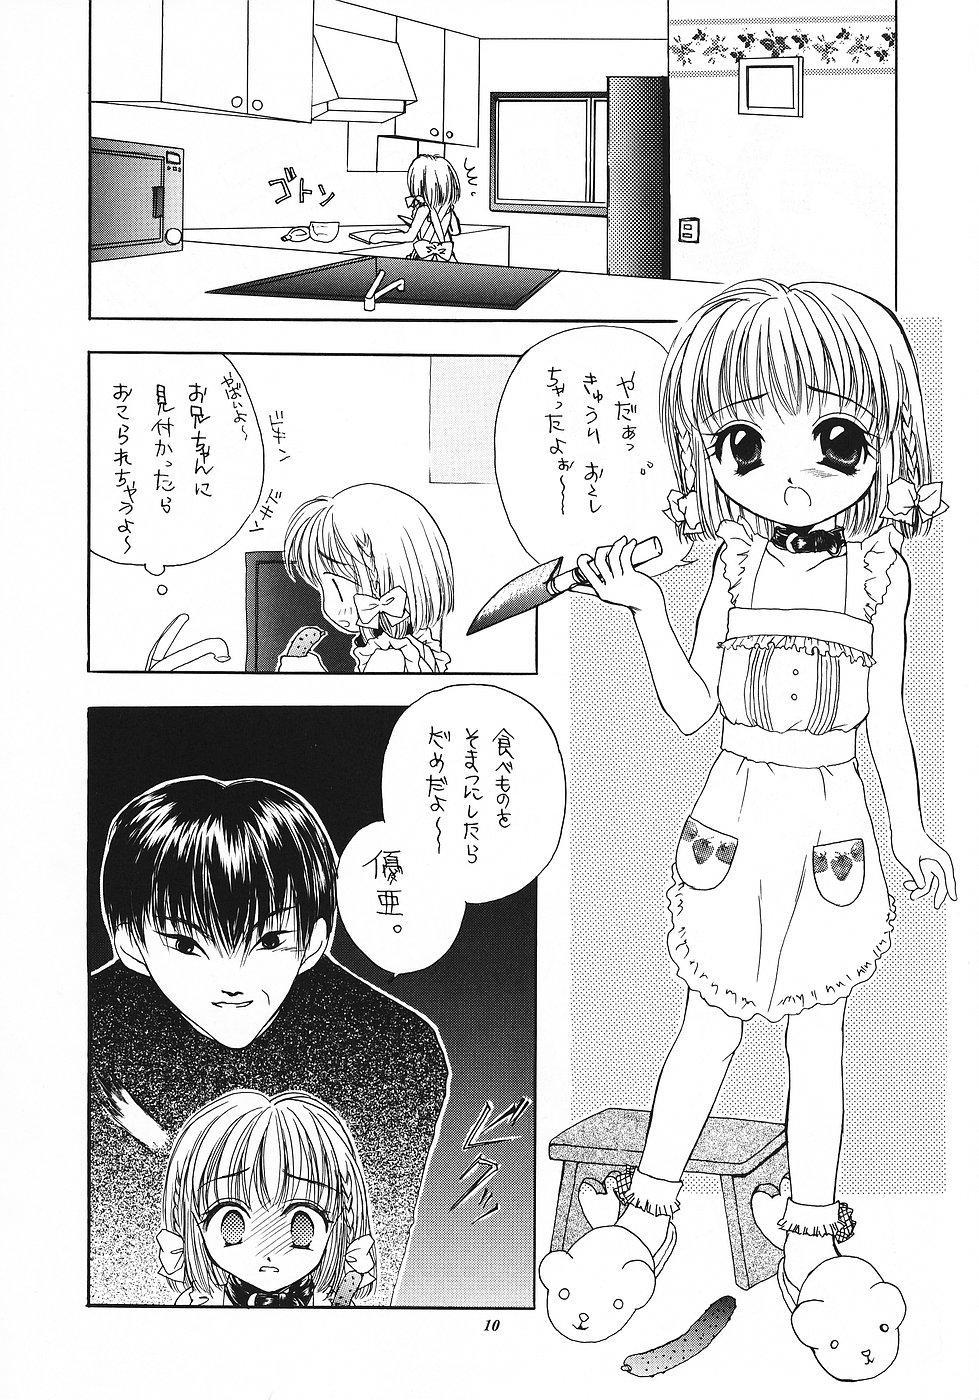 Shikisaiengi 3 8